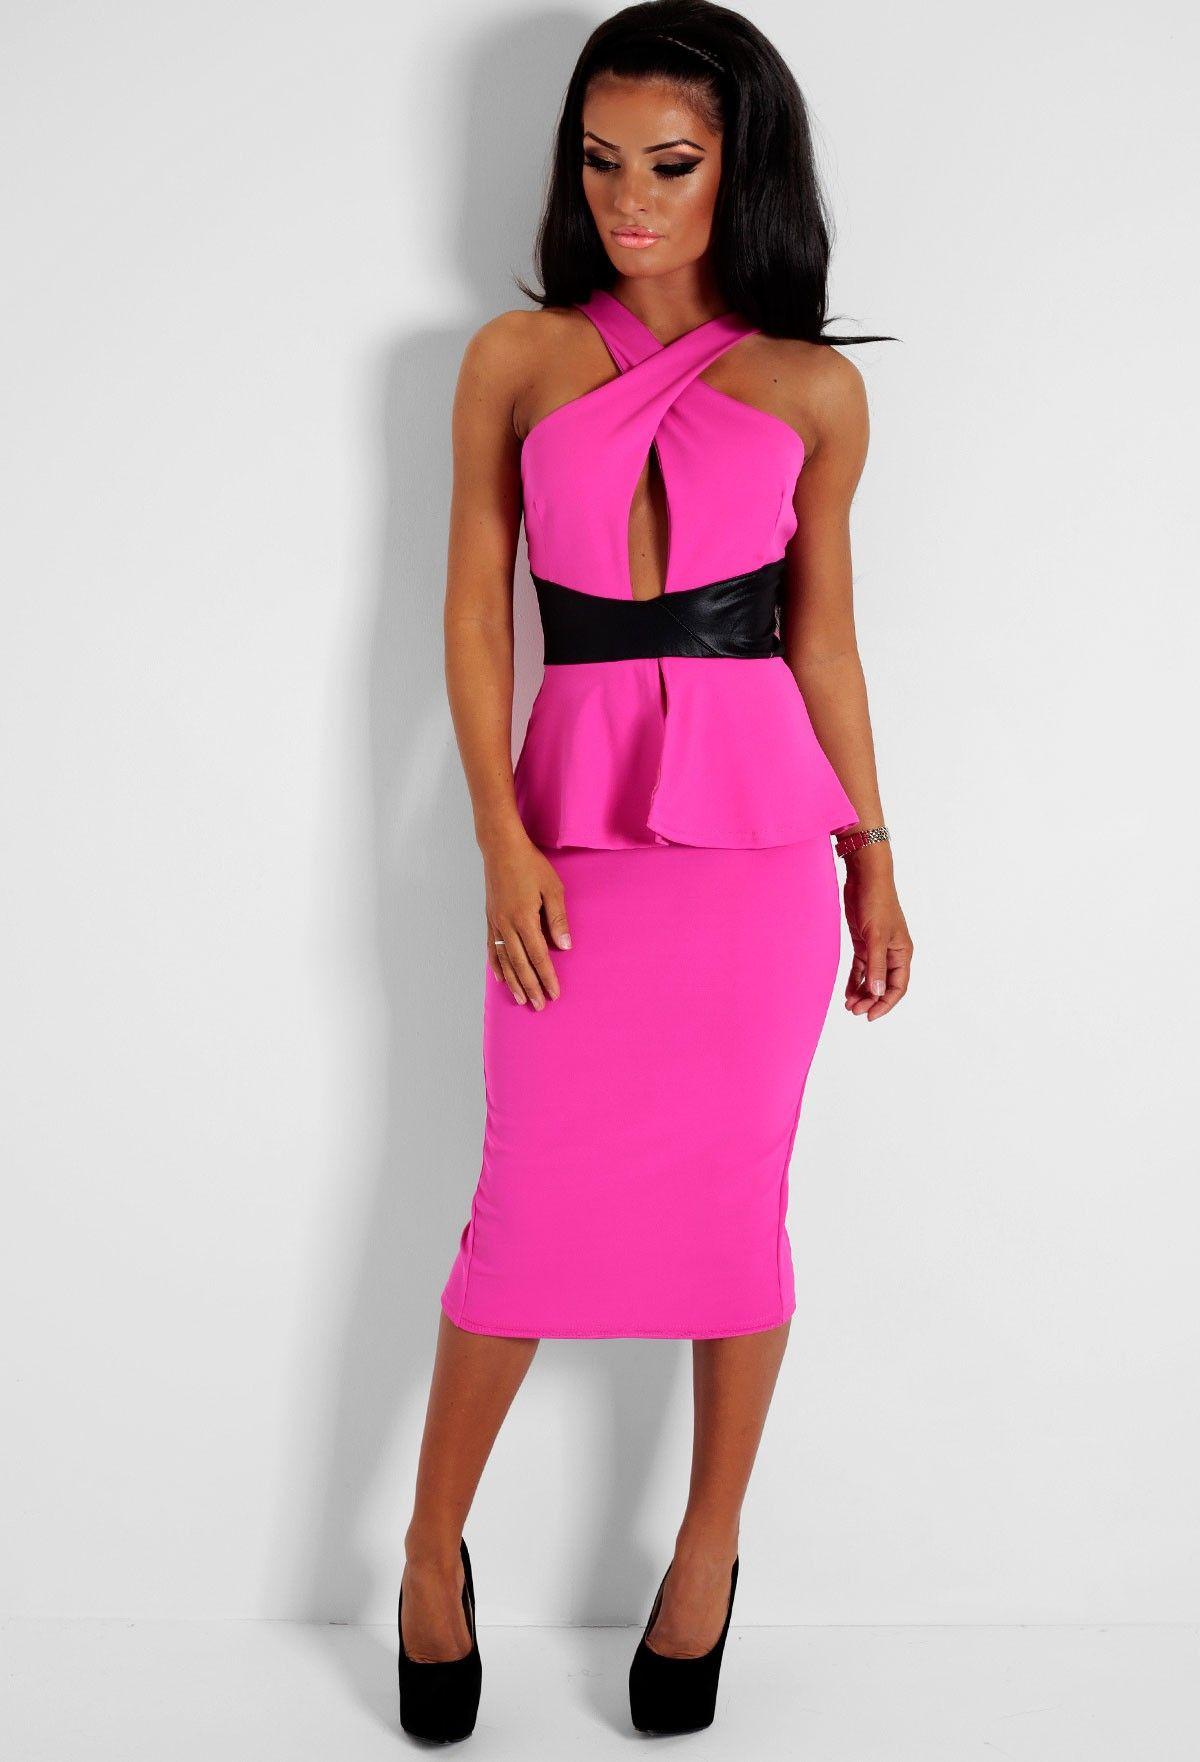 Paris Pink and Black Leatherette Peplum Midi Dress | Pink Boutique ...